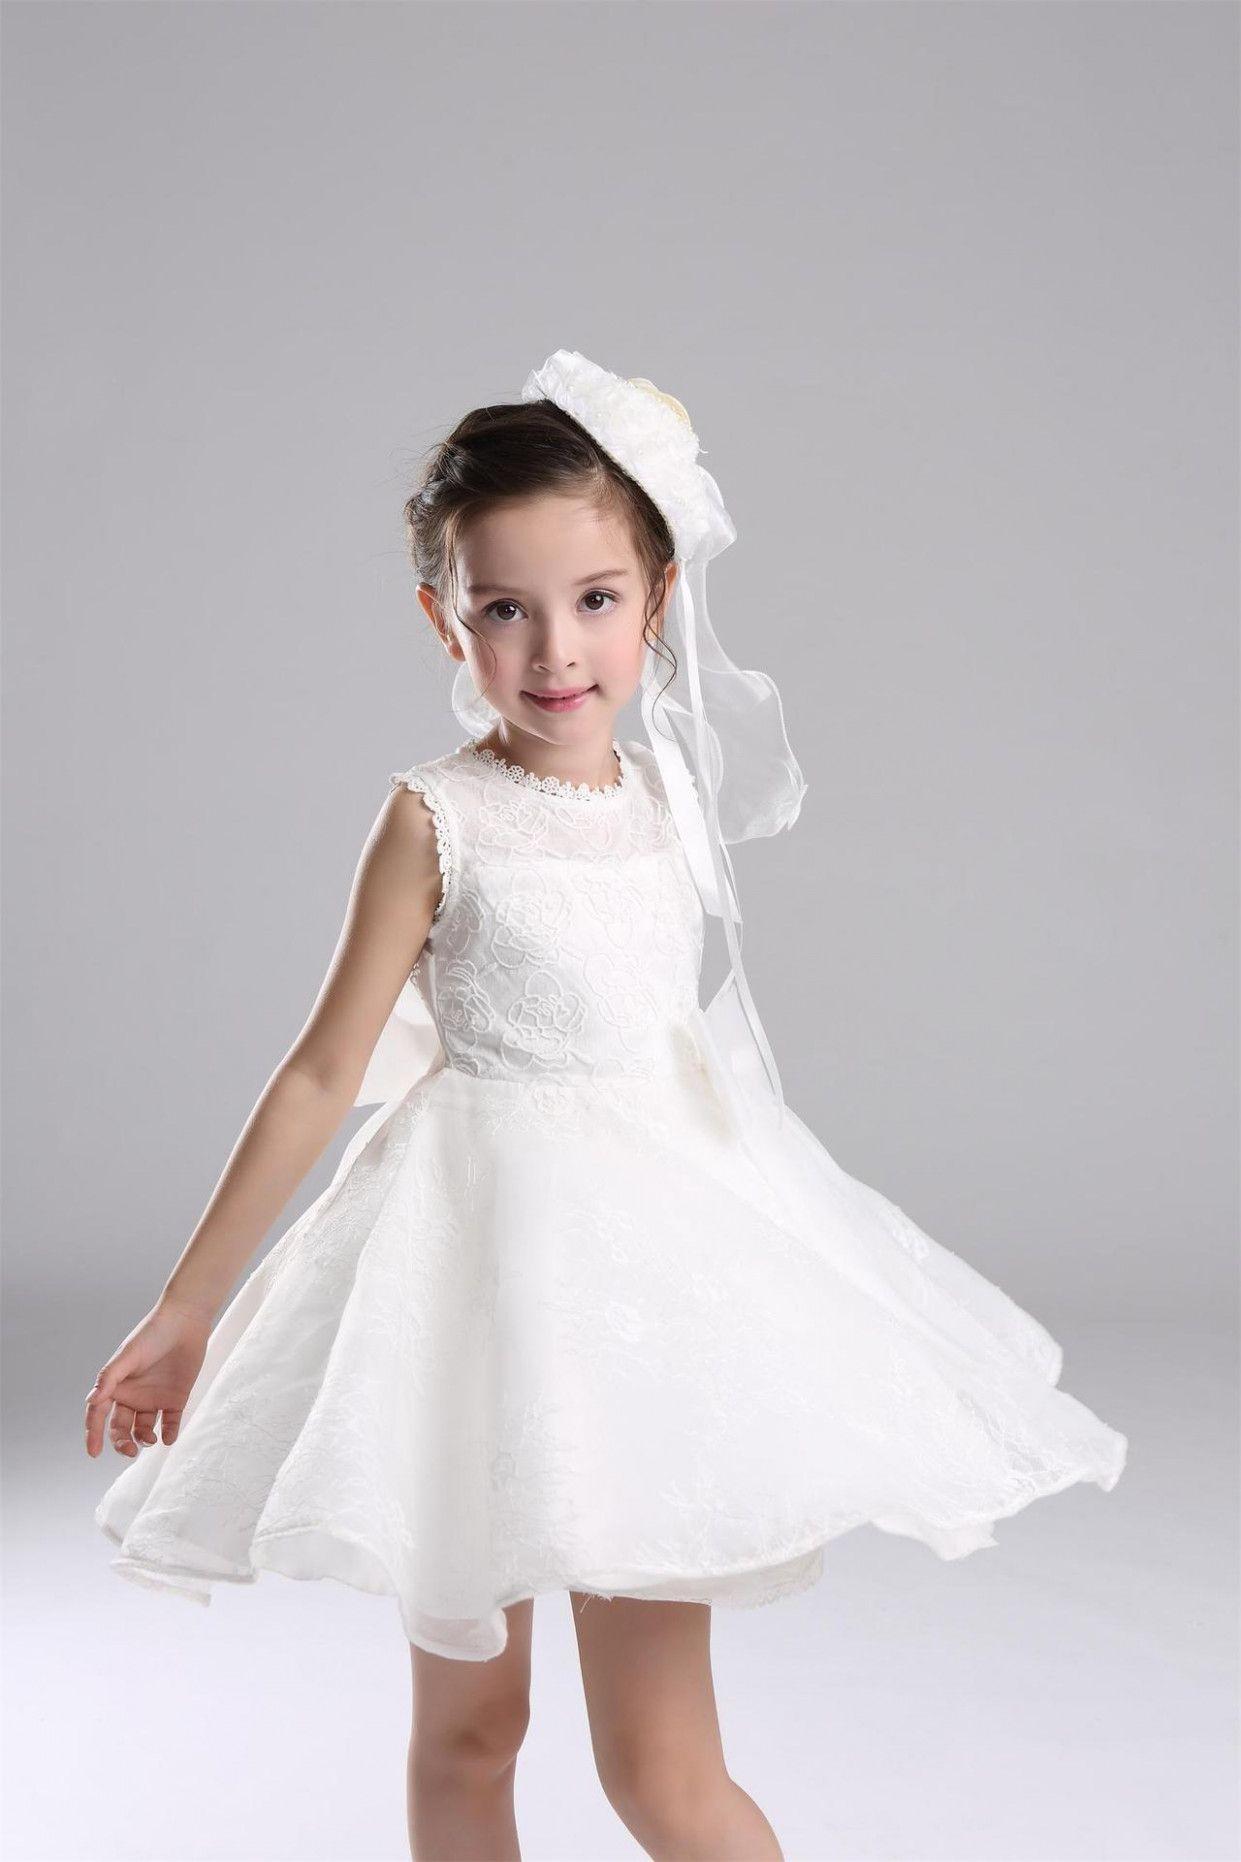 Baby dresses for wedding  Baby Girl Dress Children Wedding Dress Princess Bridesmaid Flower